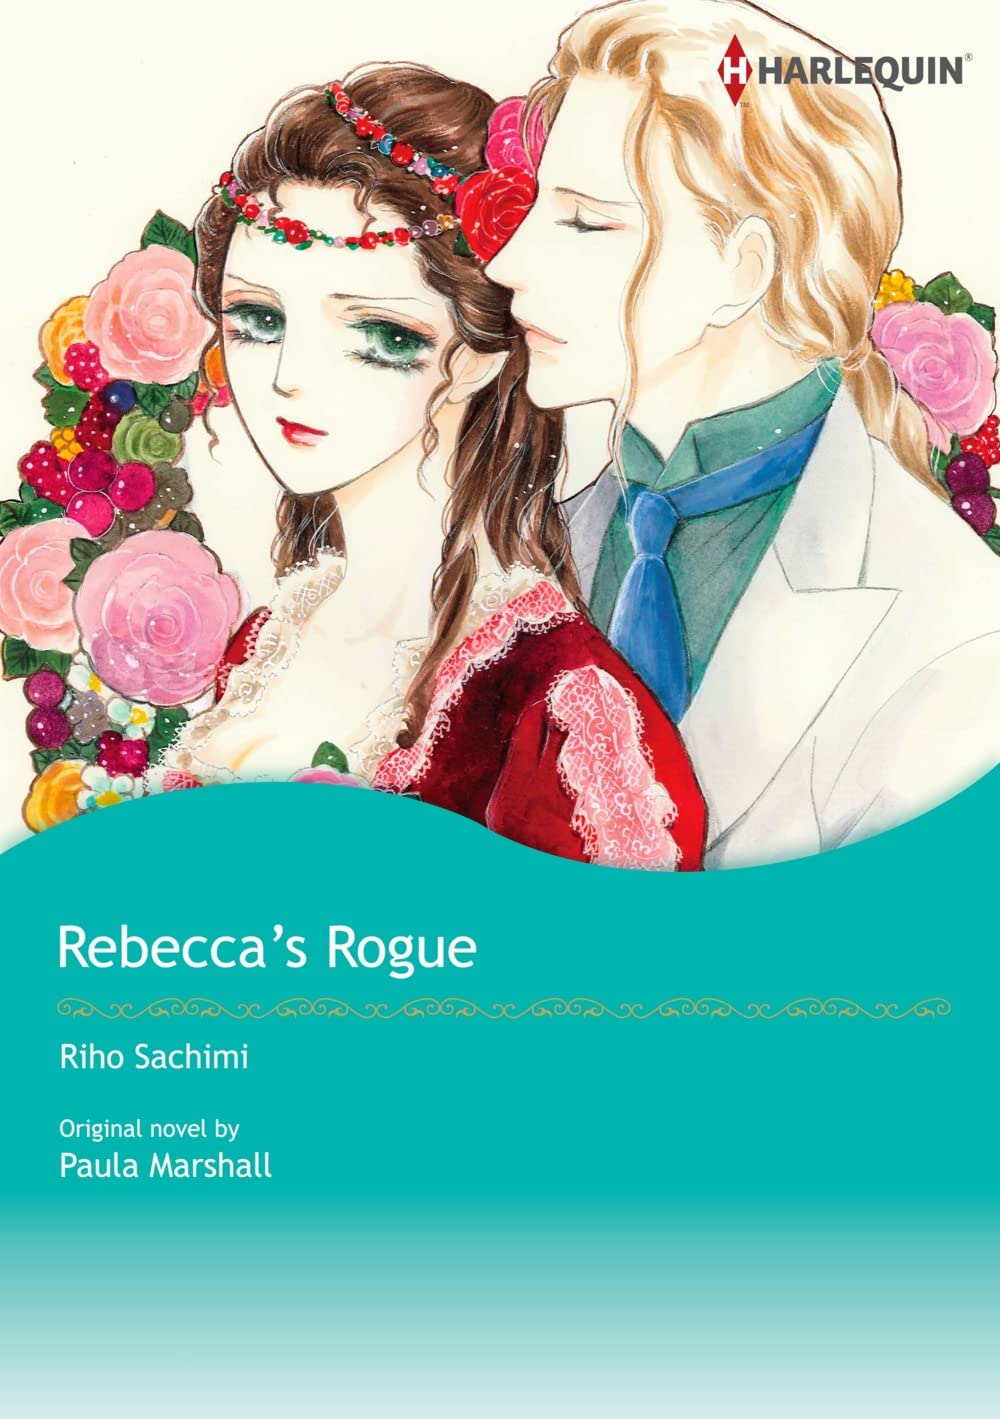 Rebecca's Rogue